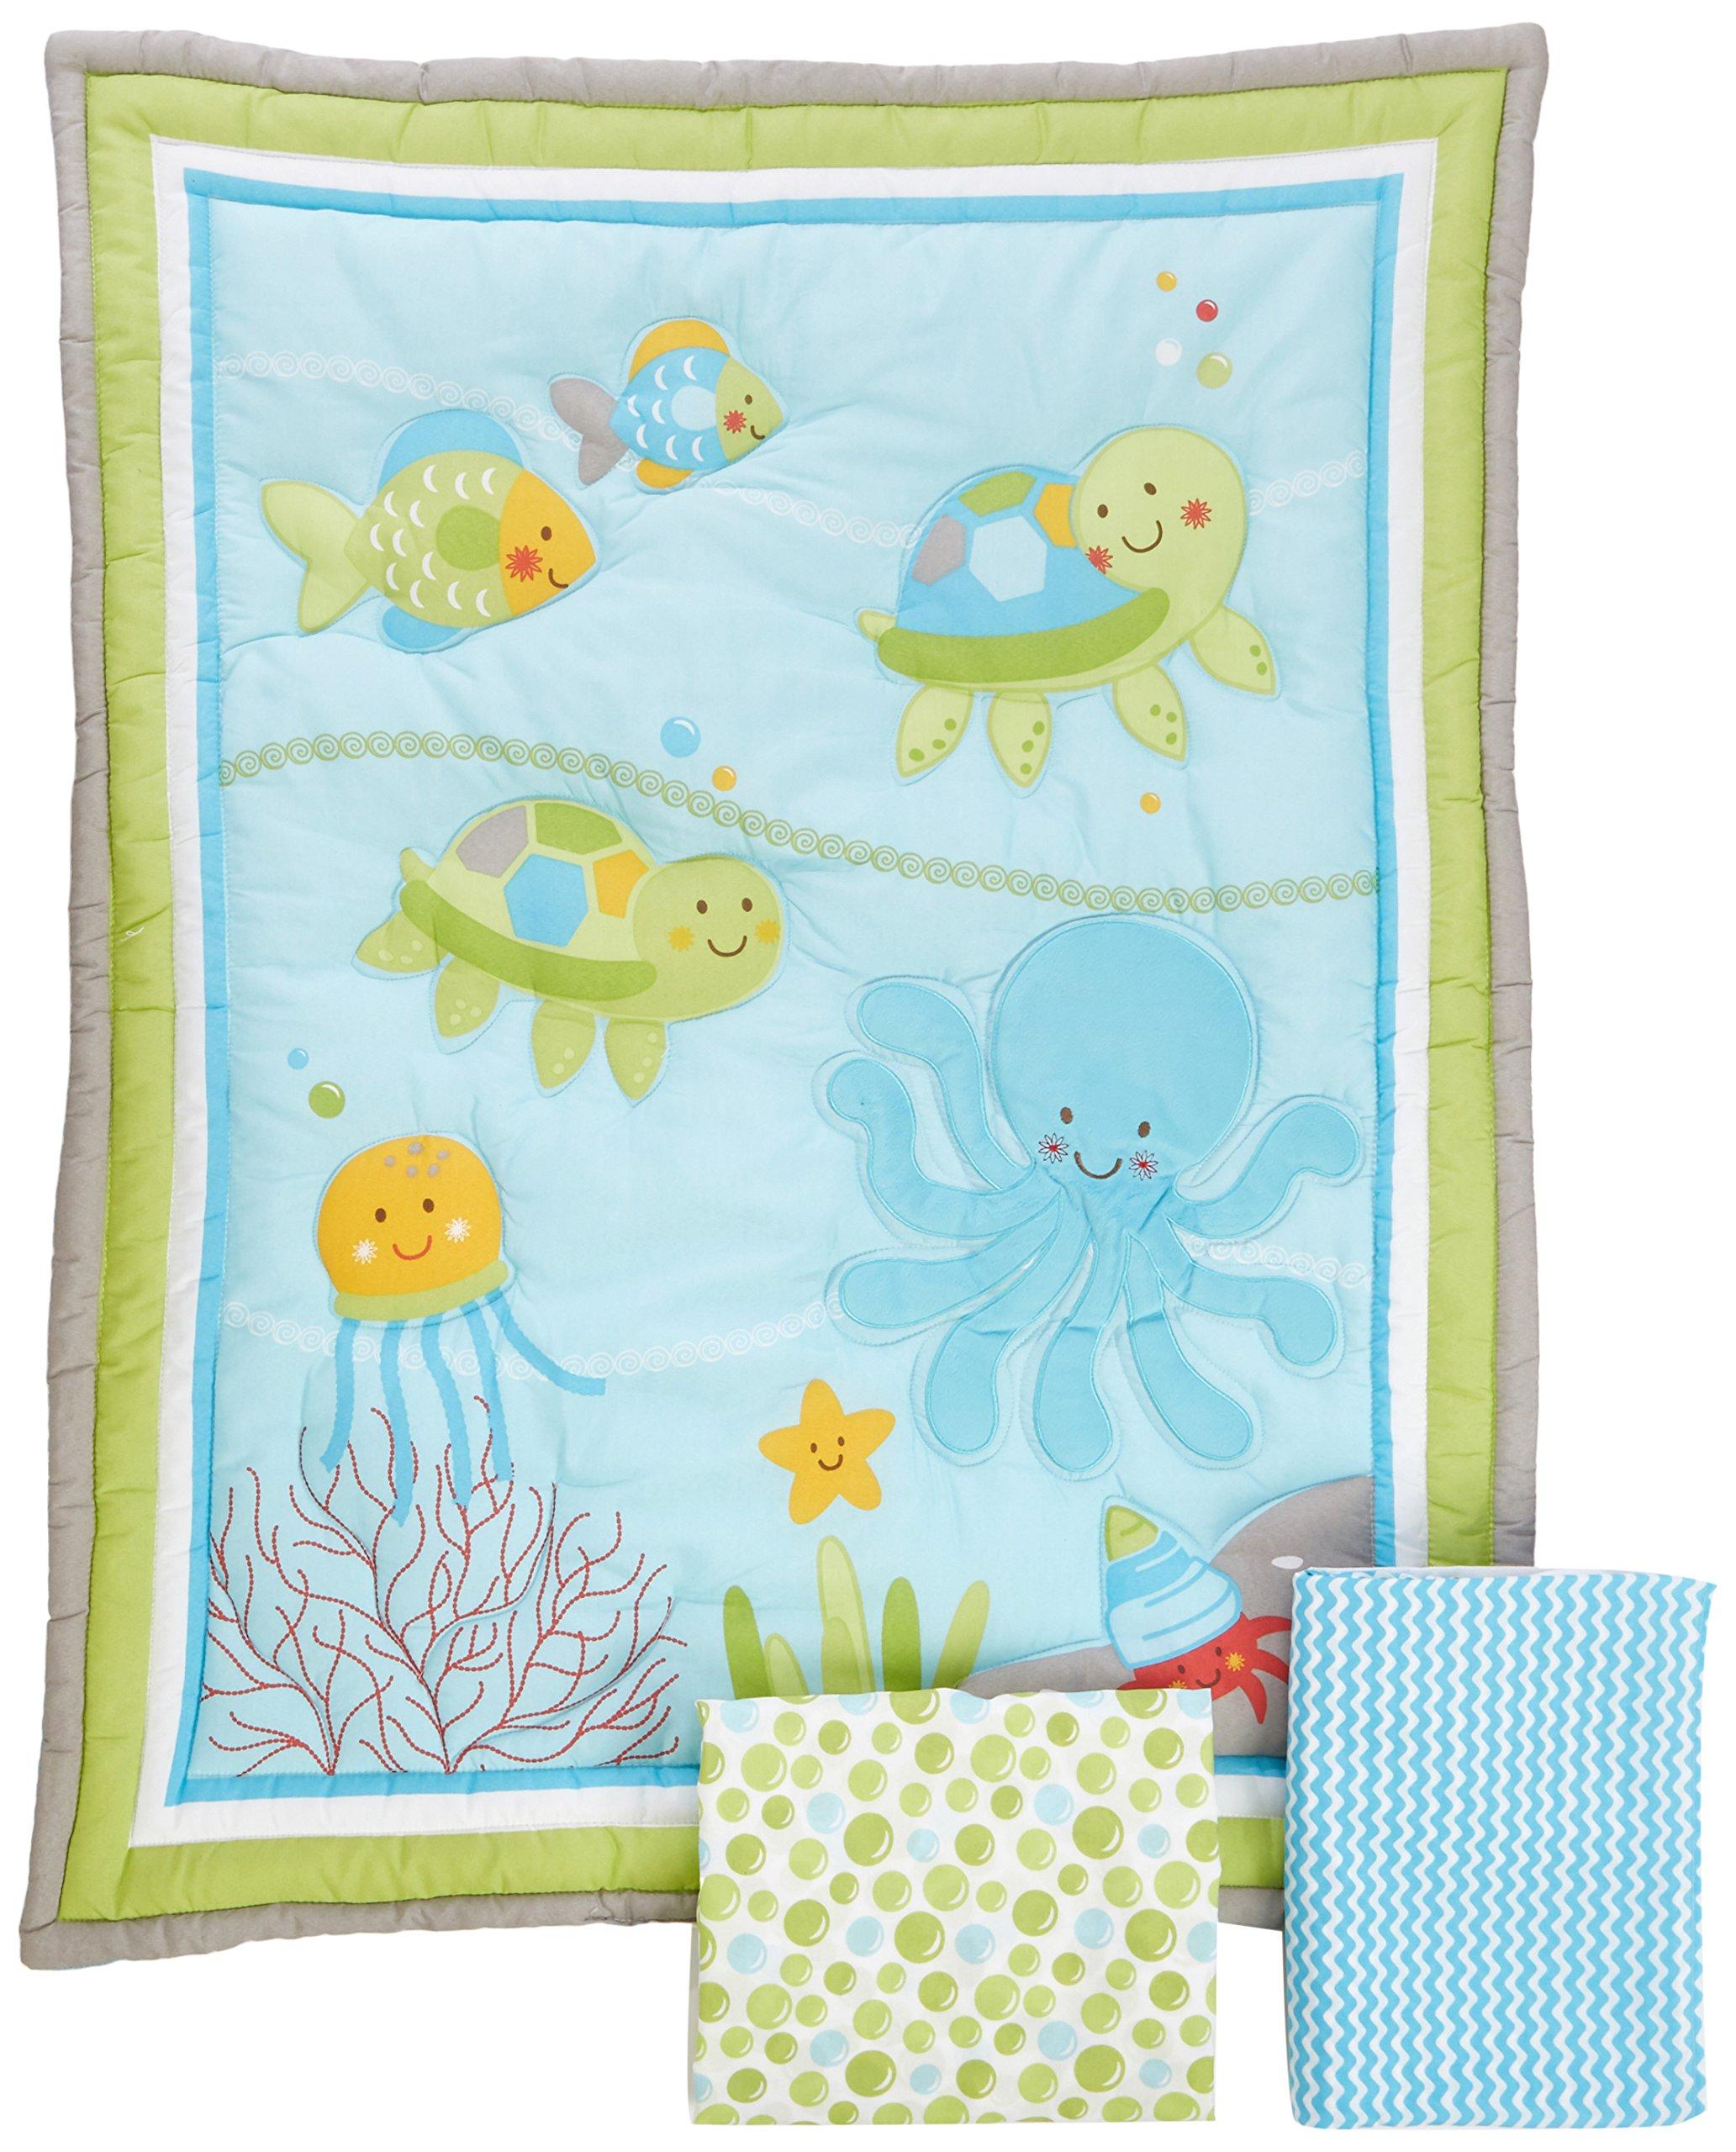 NoJo Little Bedding Ocean Dreams 3 Piece Crib Bedding Set